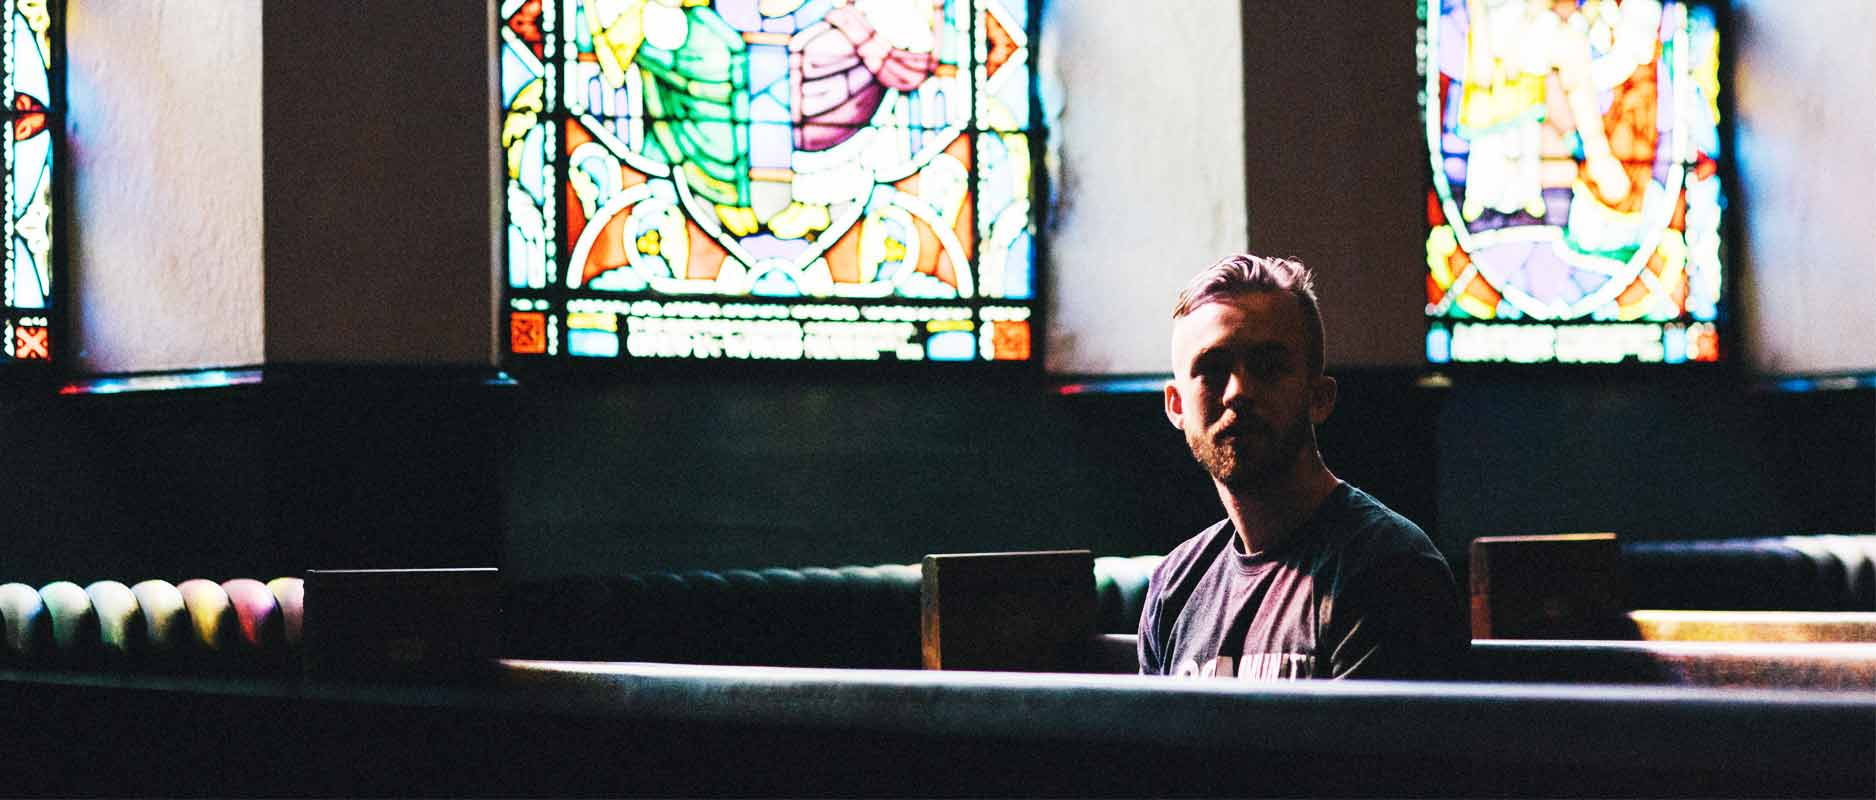 Jij en de kerk